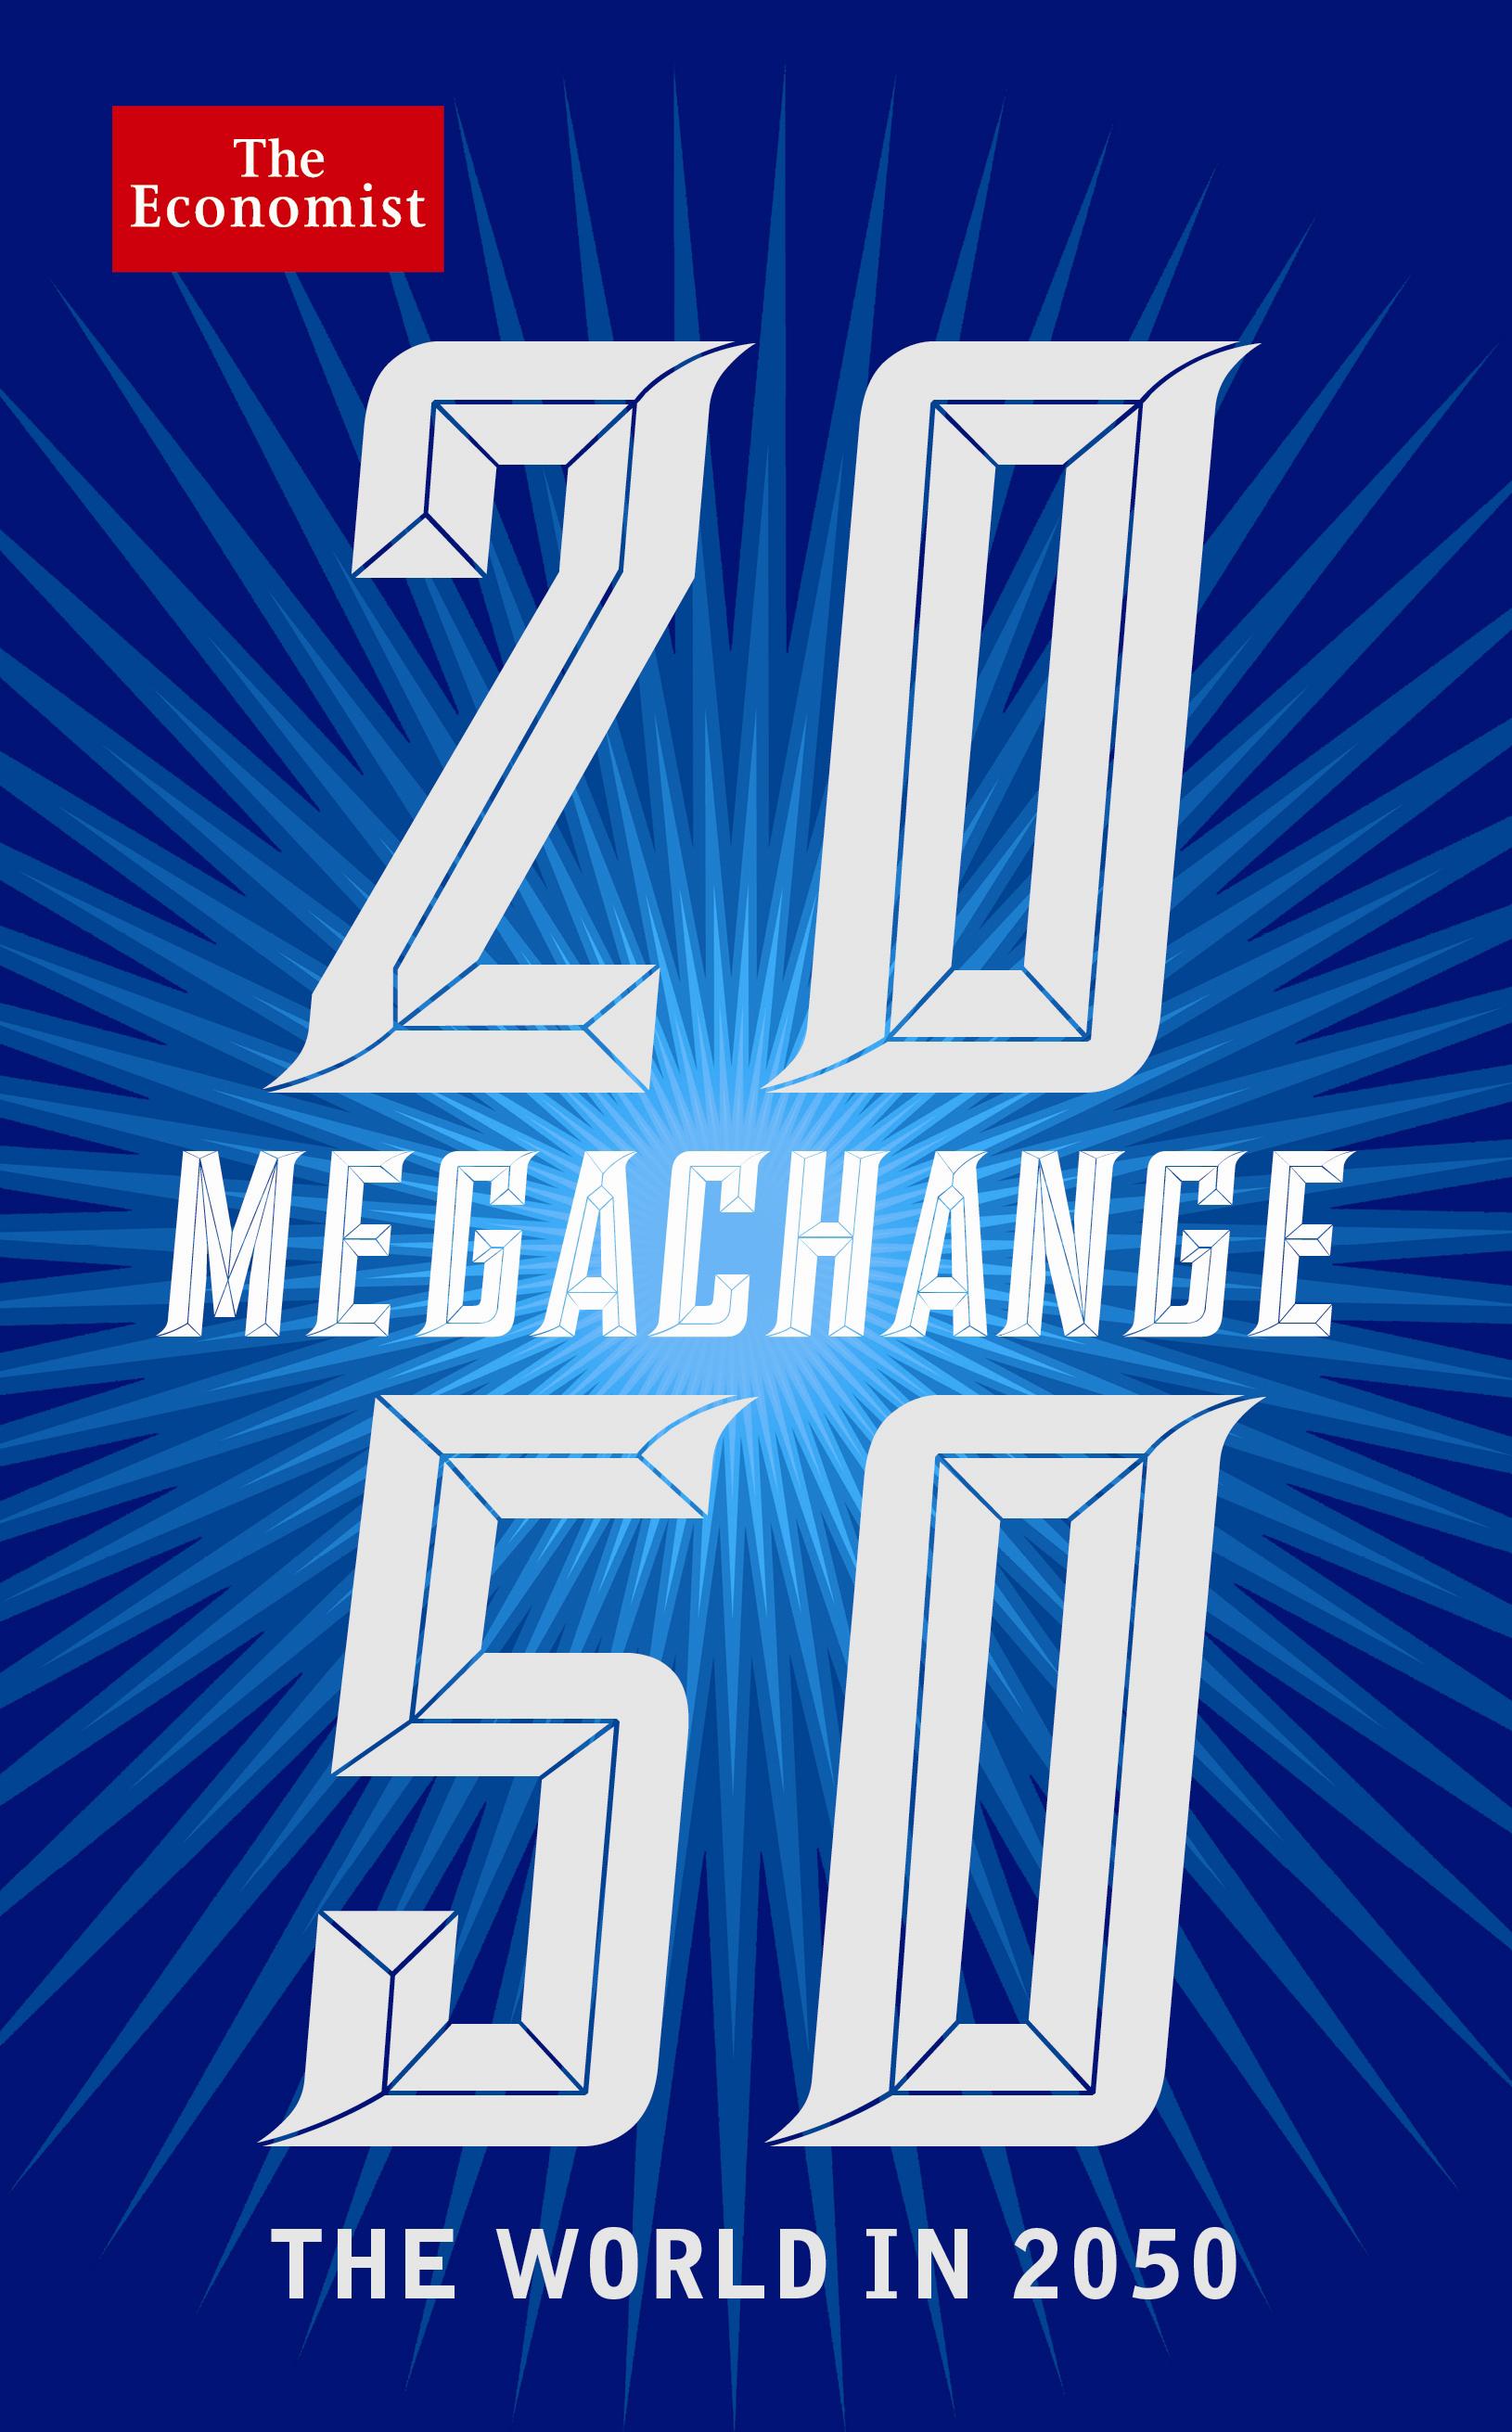 Megachange - edited by Daniel Franklin, The Economist edited